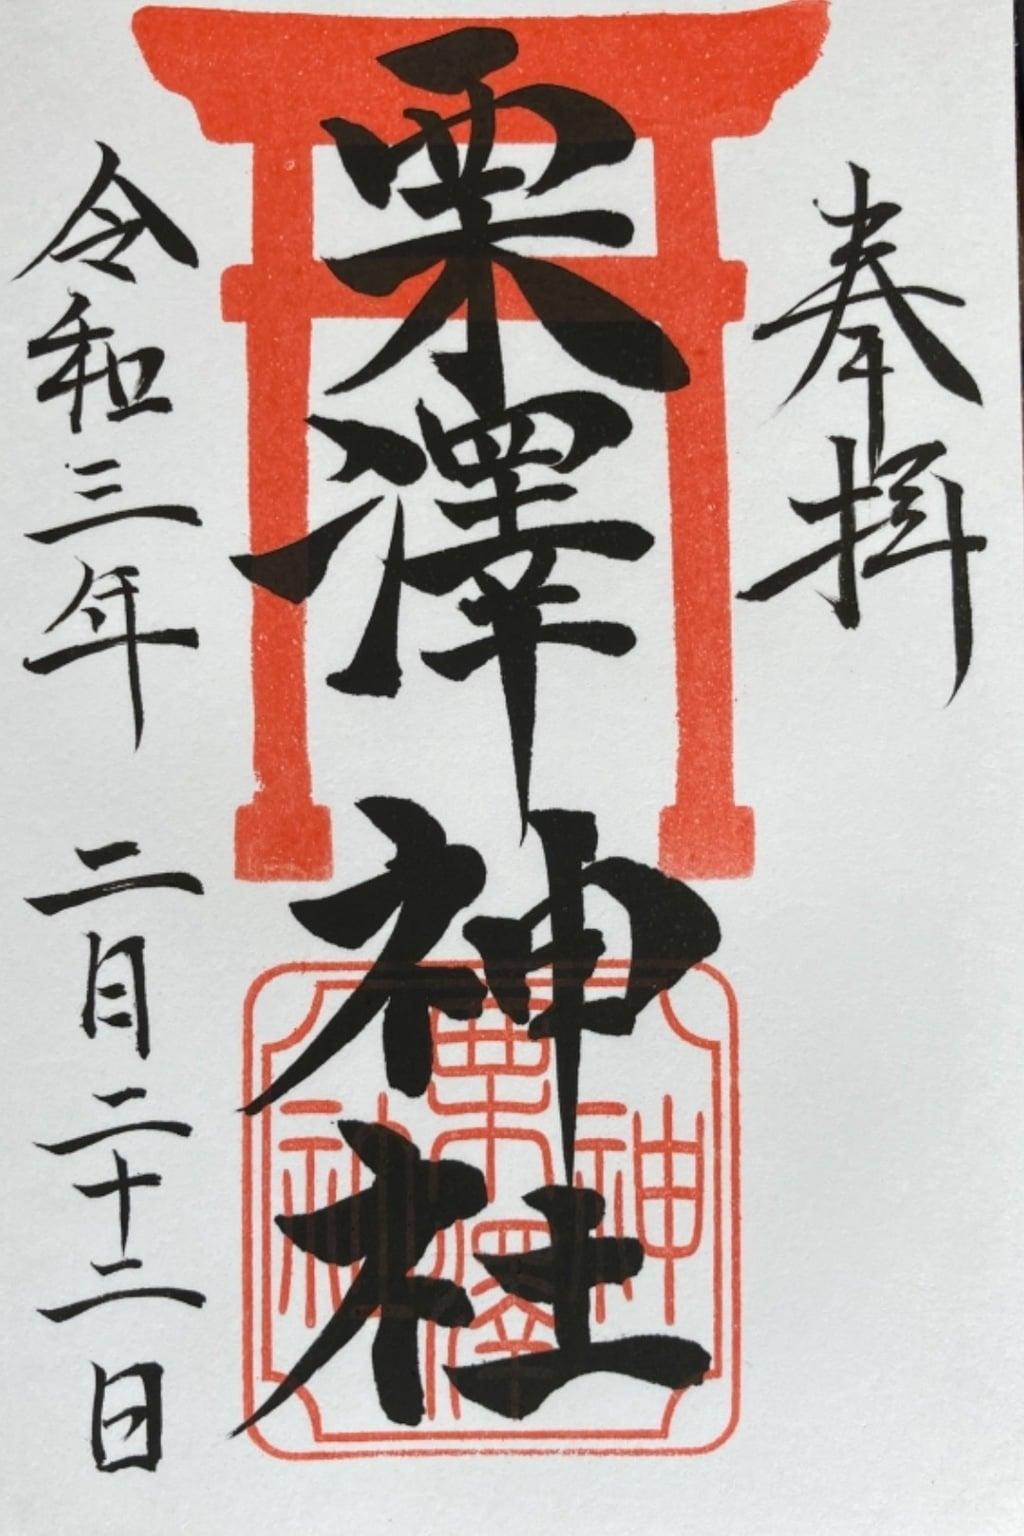 栗沢神社の御朱印